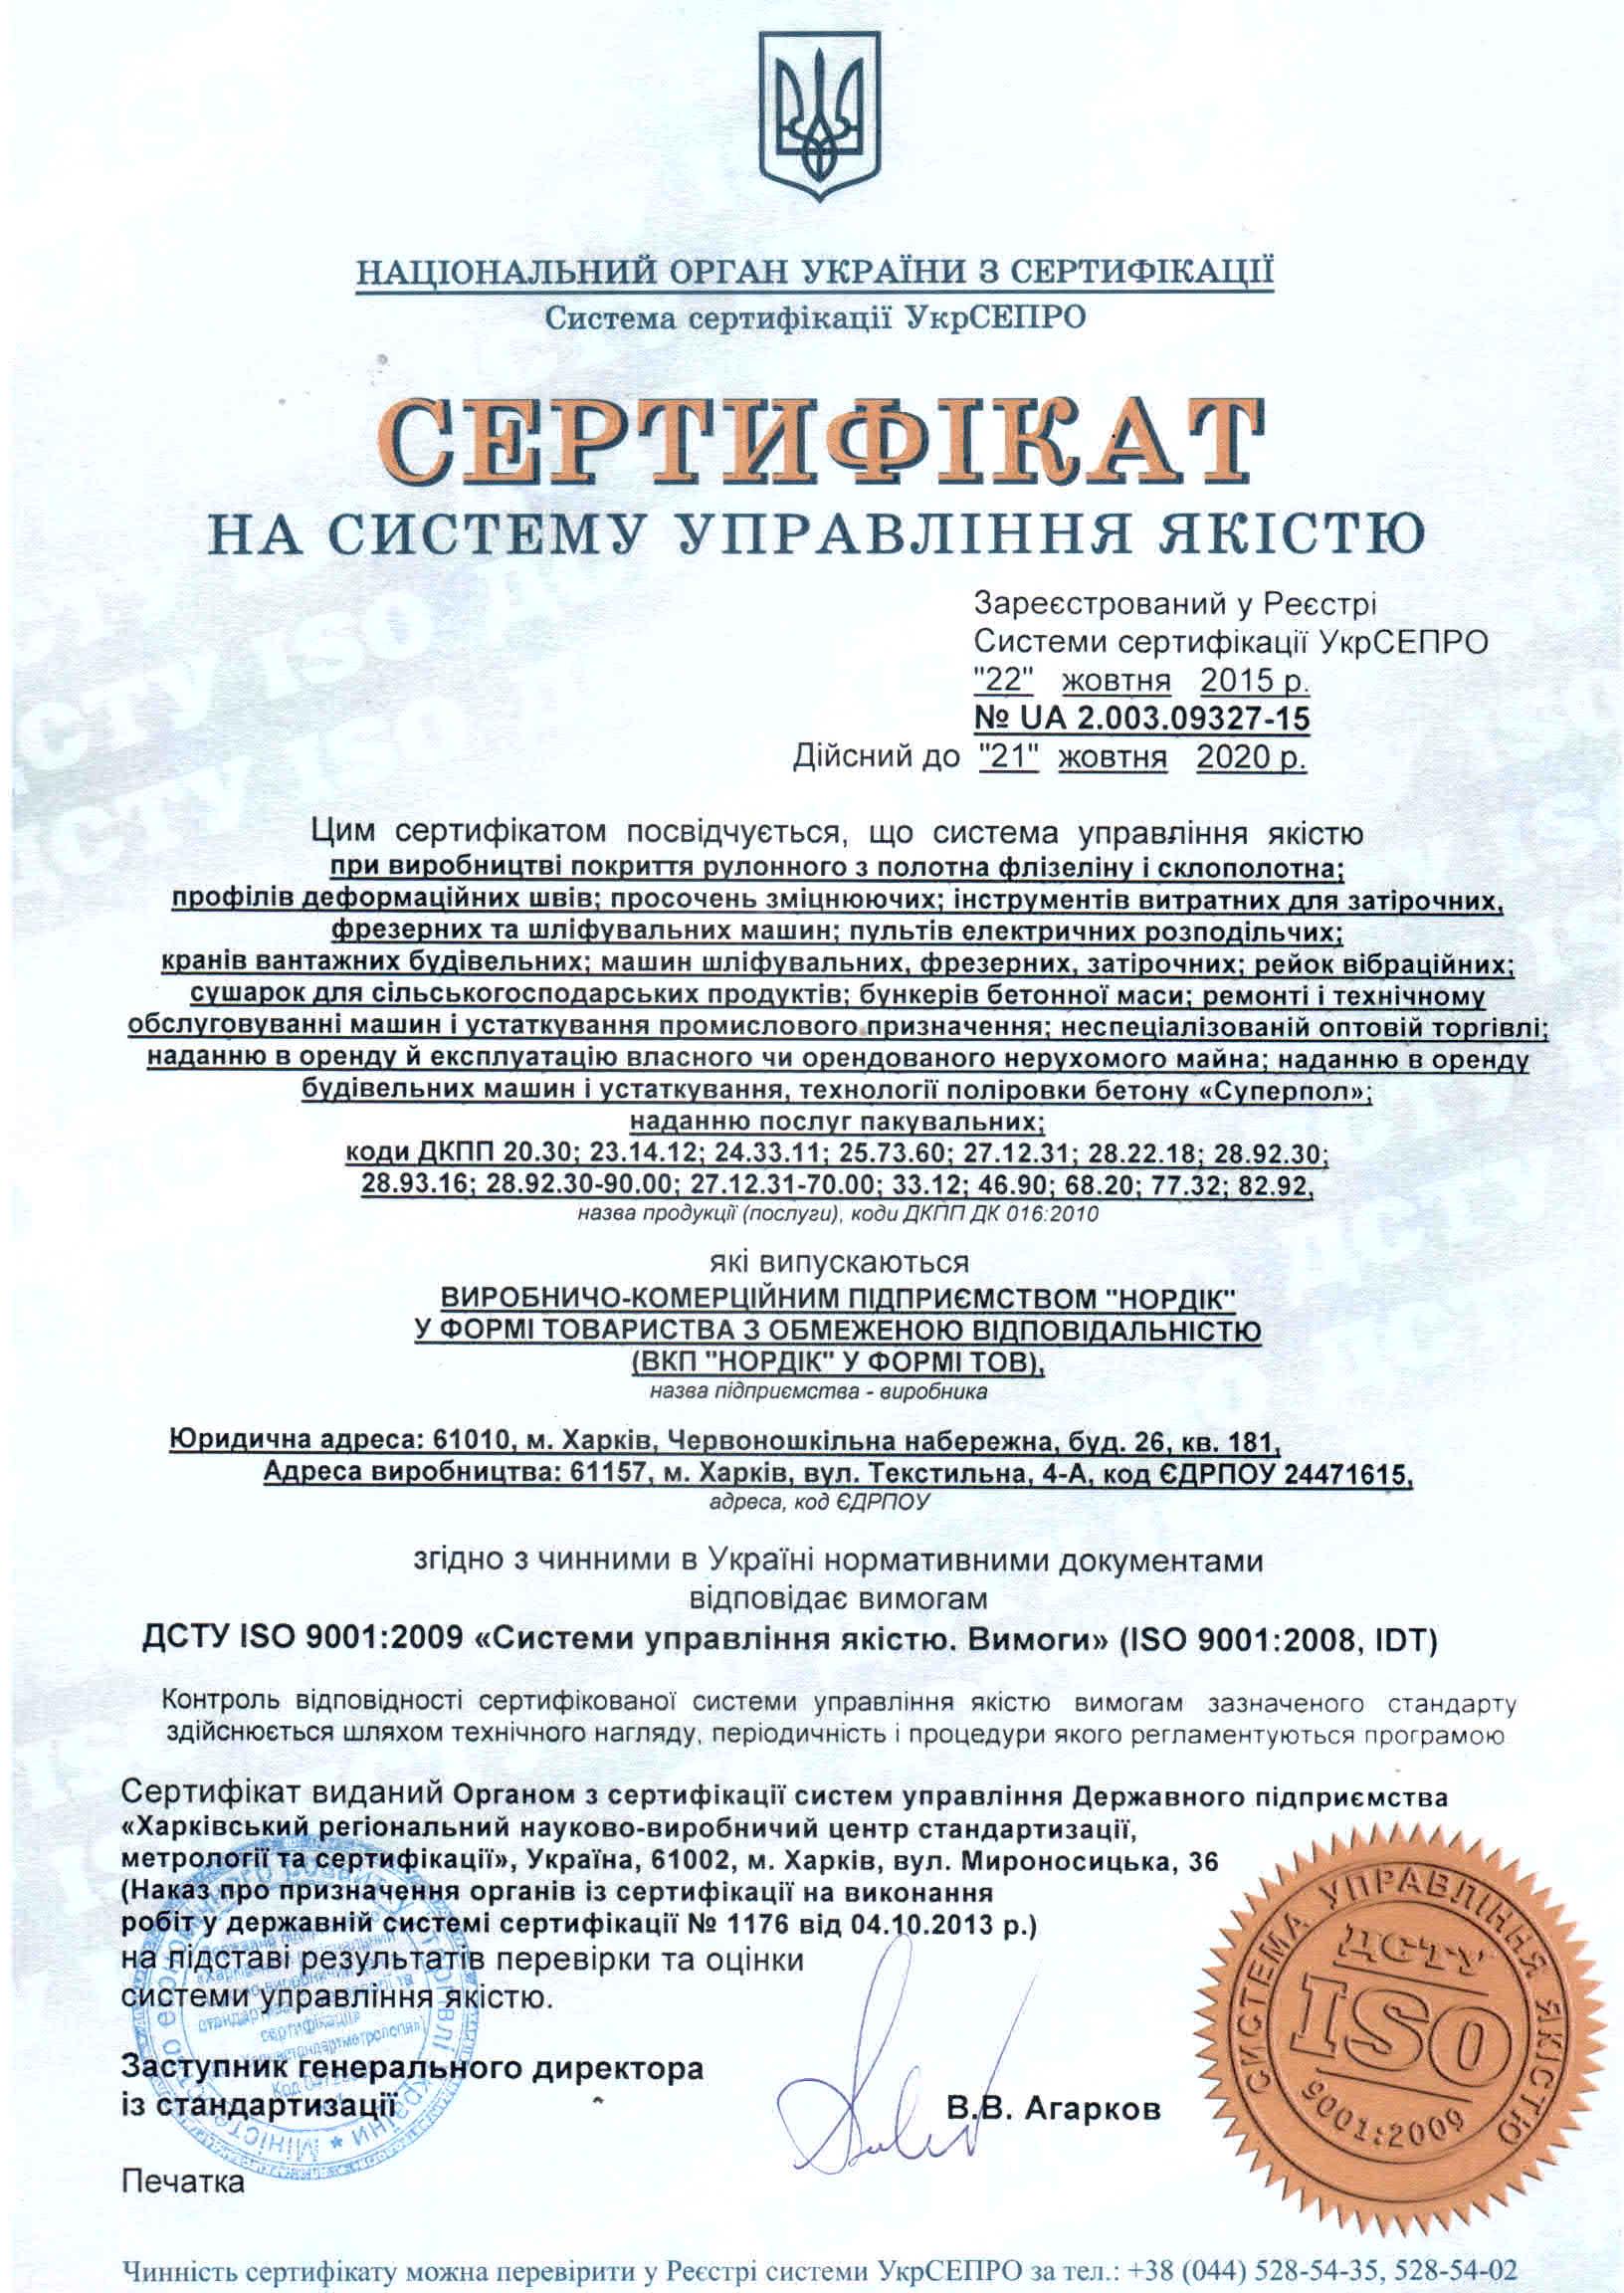 Spektrum poluchen Sertifikat ISO 9001 2009 na stroitelnoje oborudovanile, materialy i uslugi